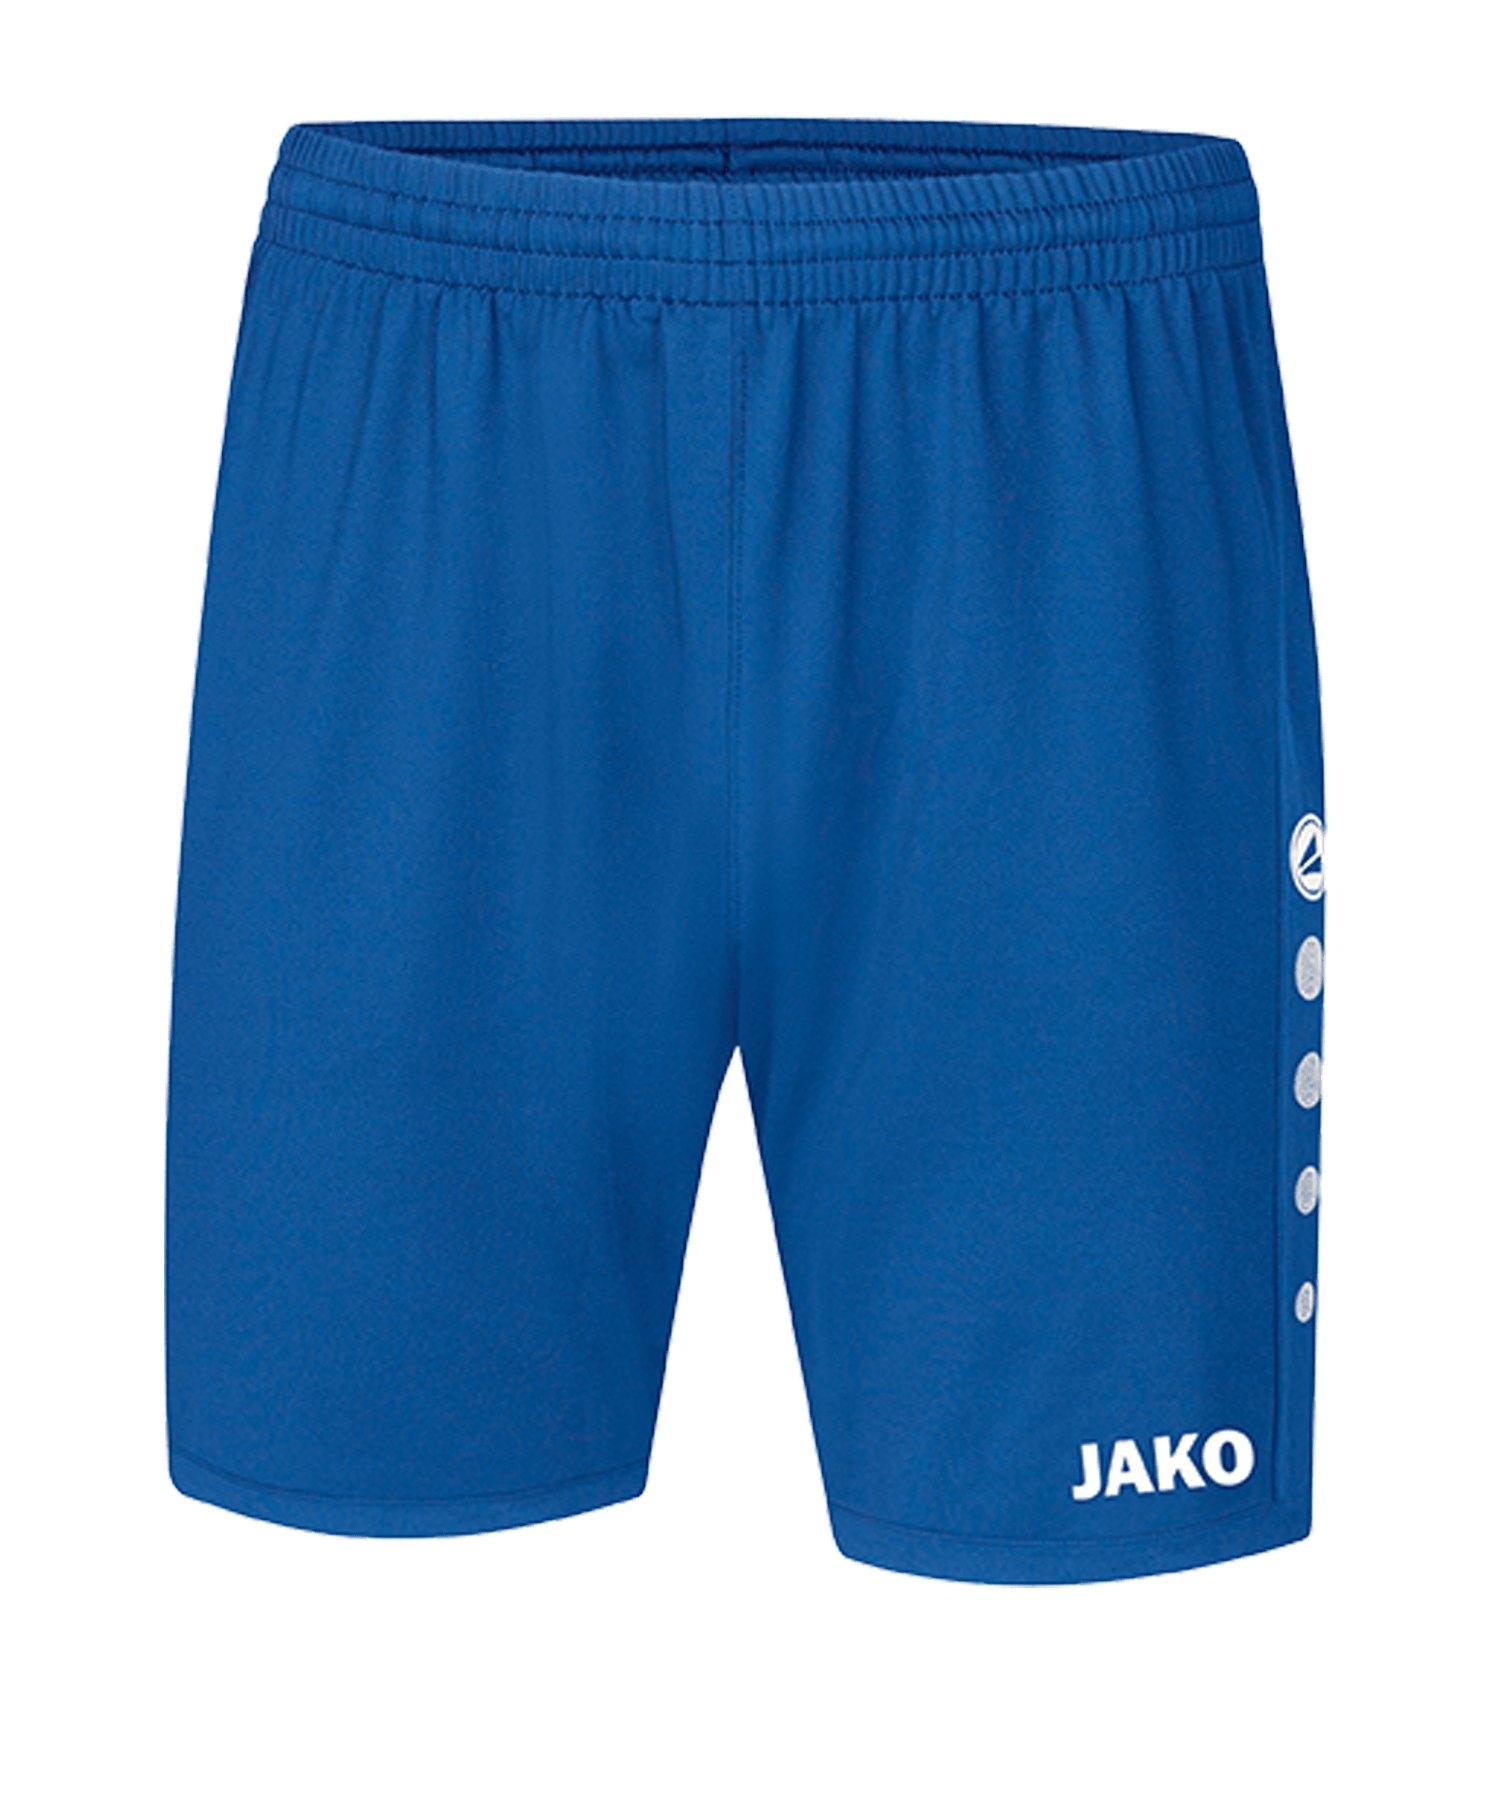 JAKO Premium Short Blau F04 - blau